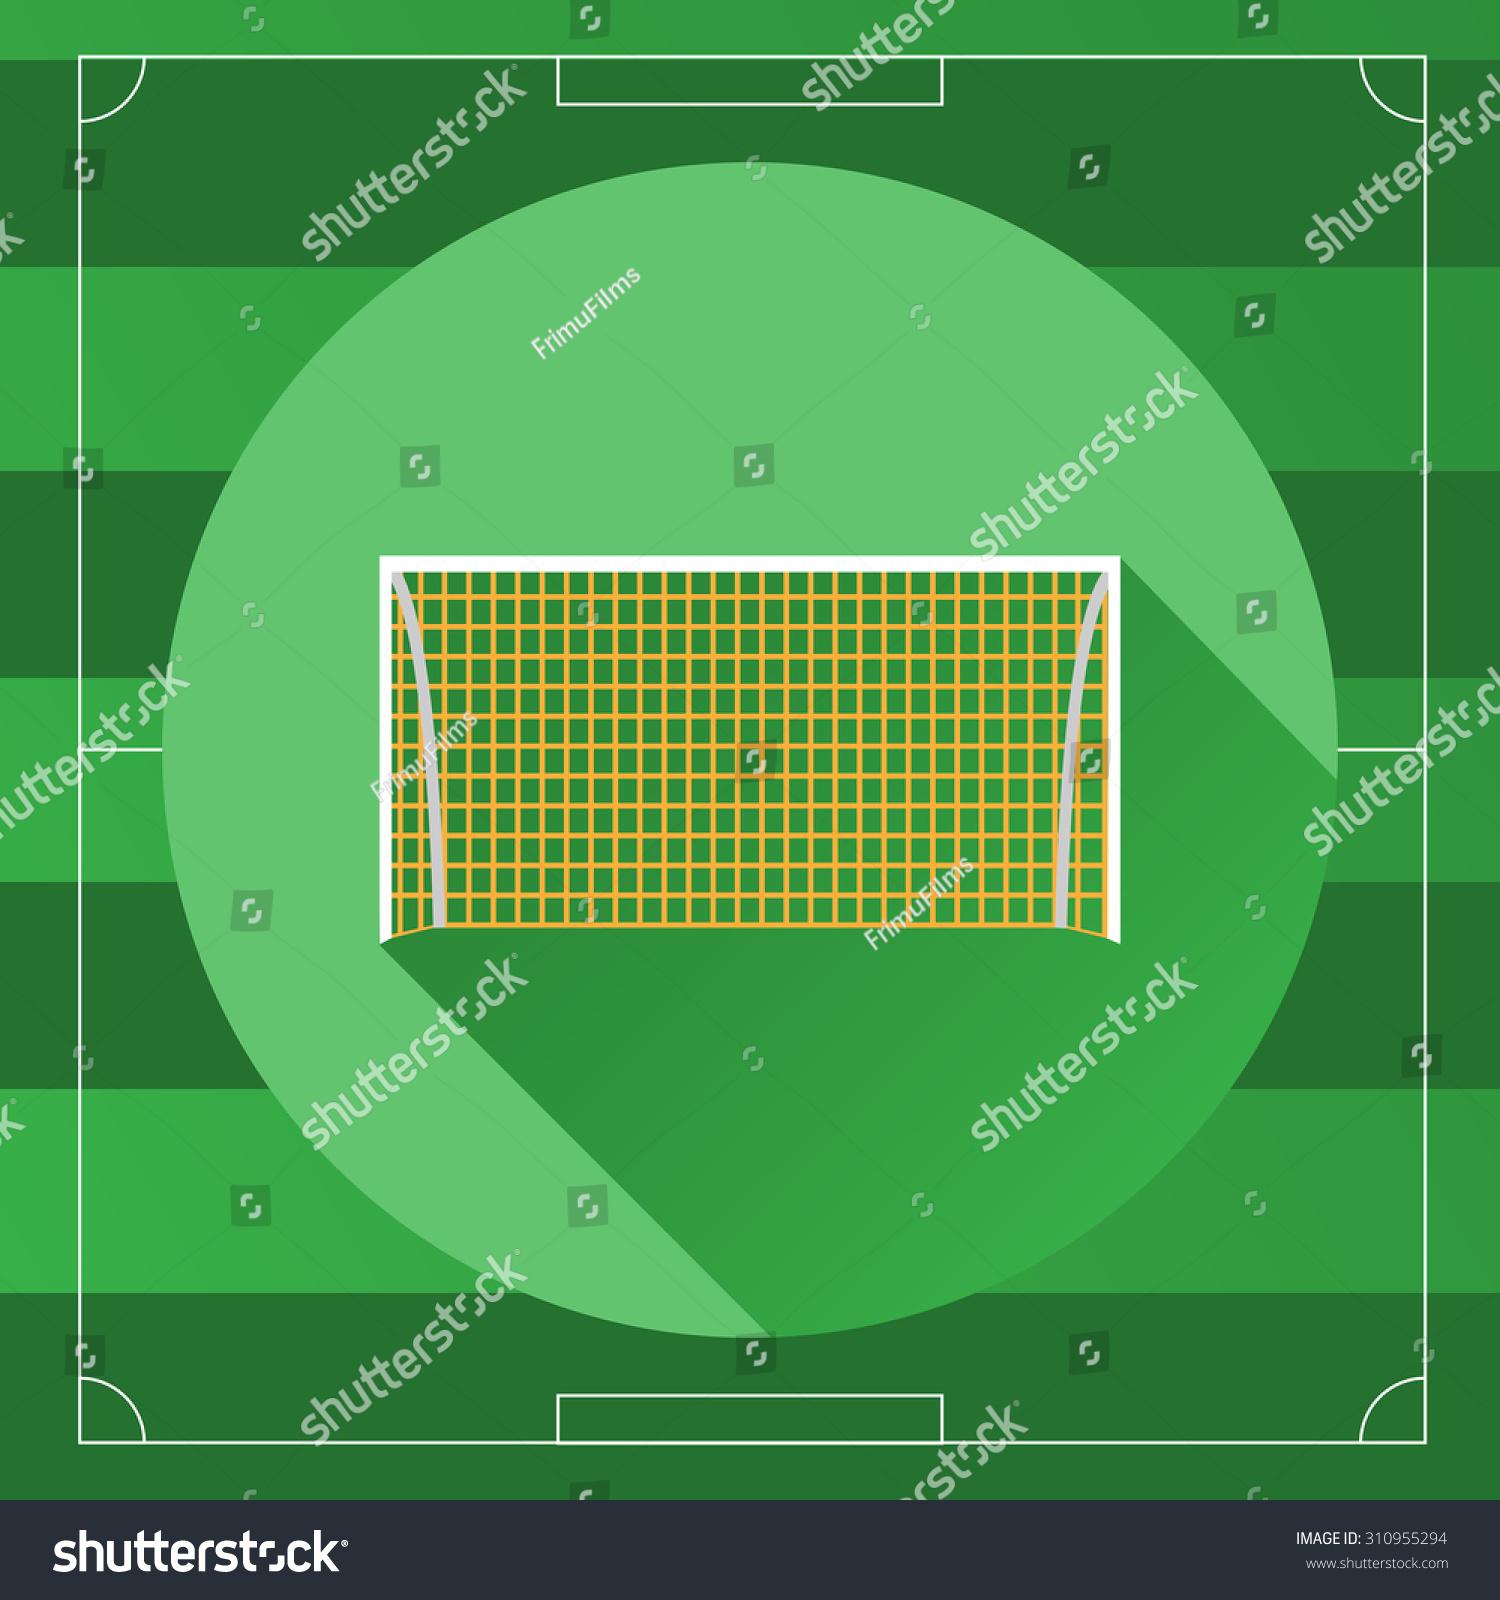 soccer goal icon on game field stock vector 310955294 shutterstock